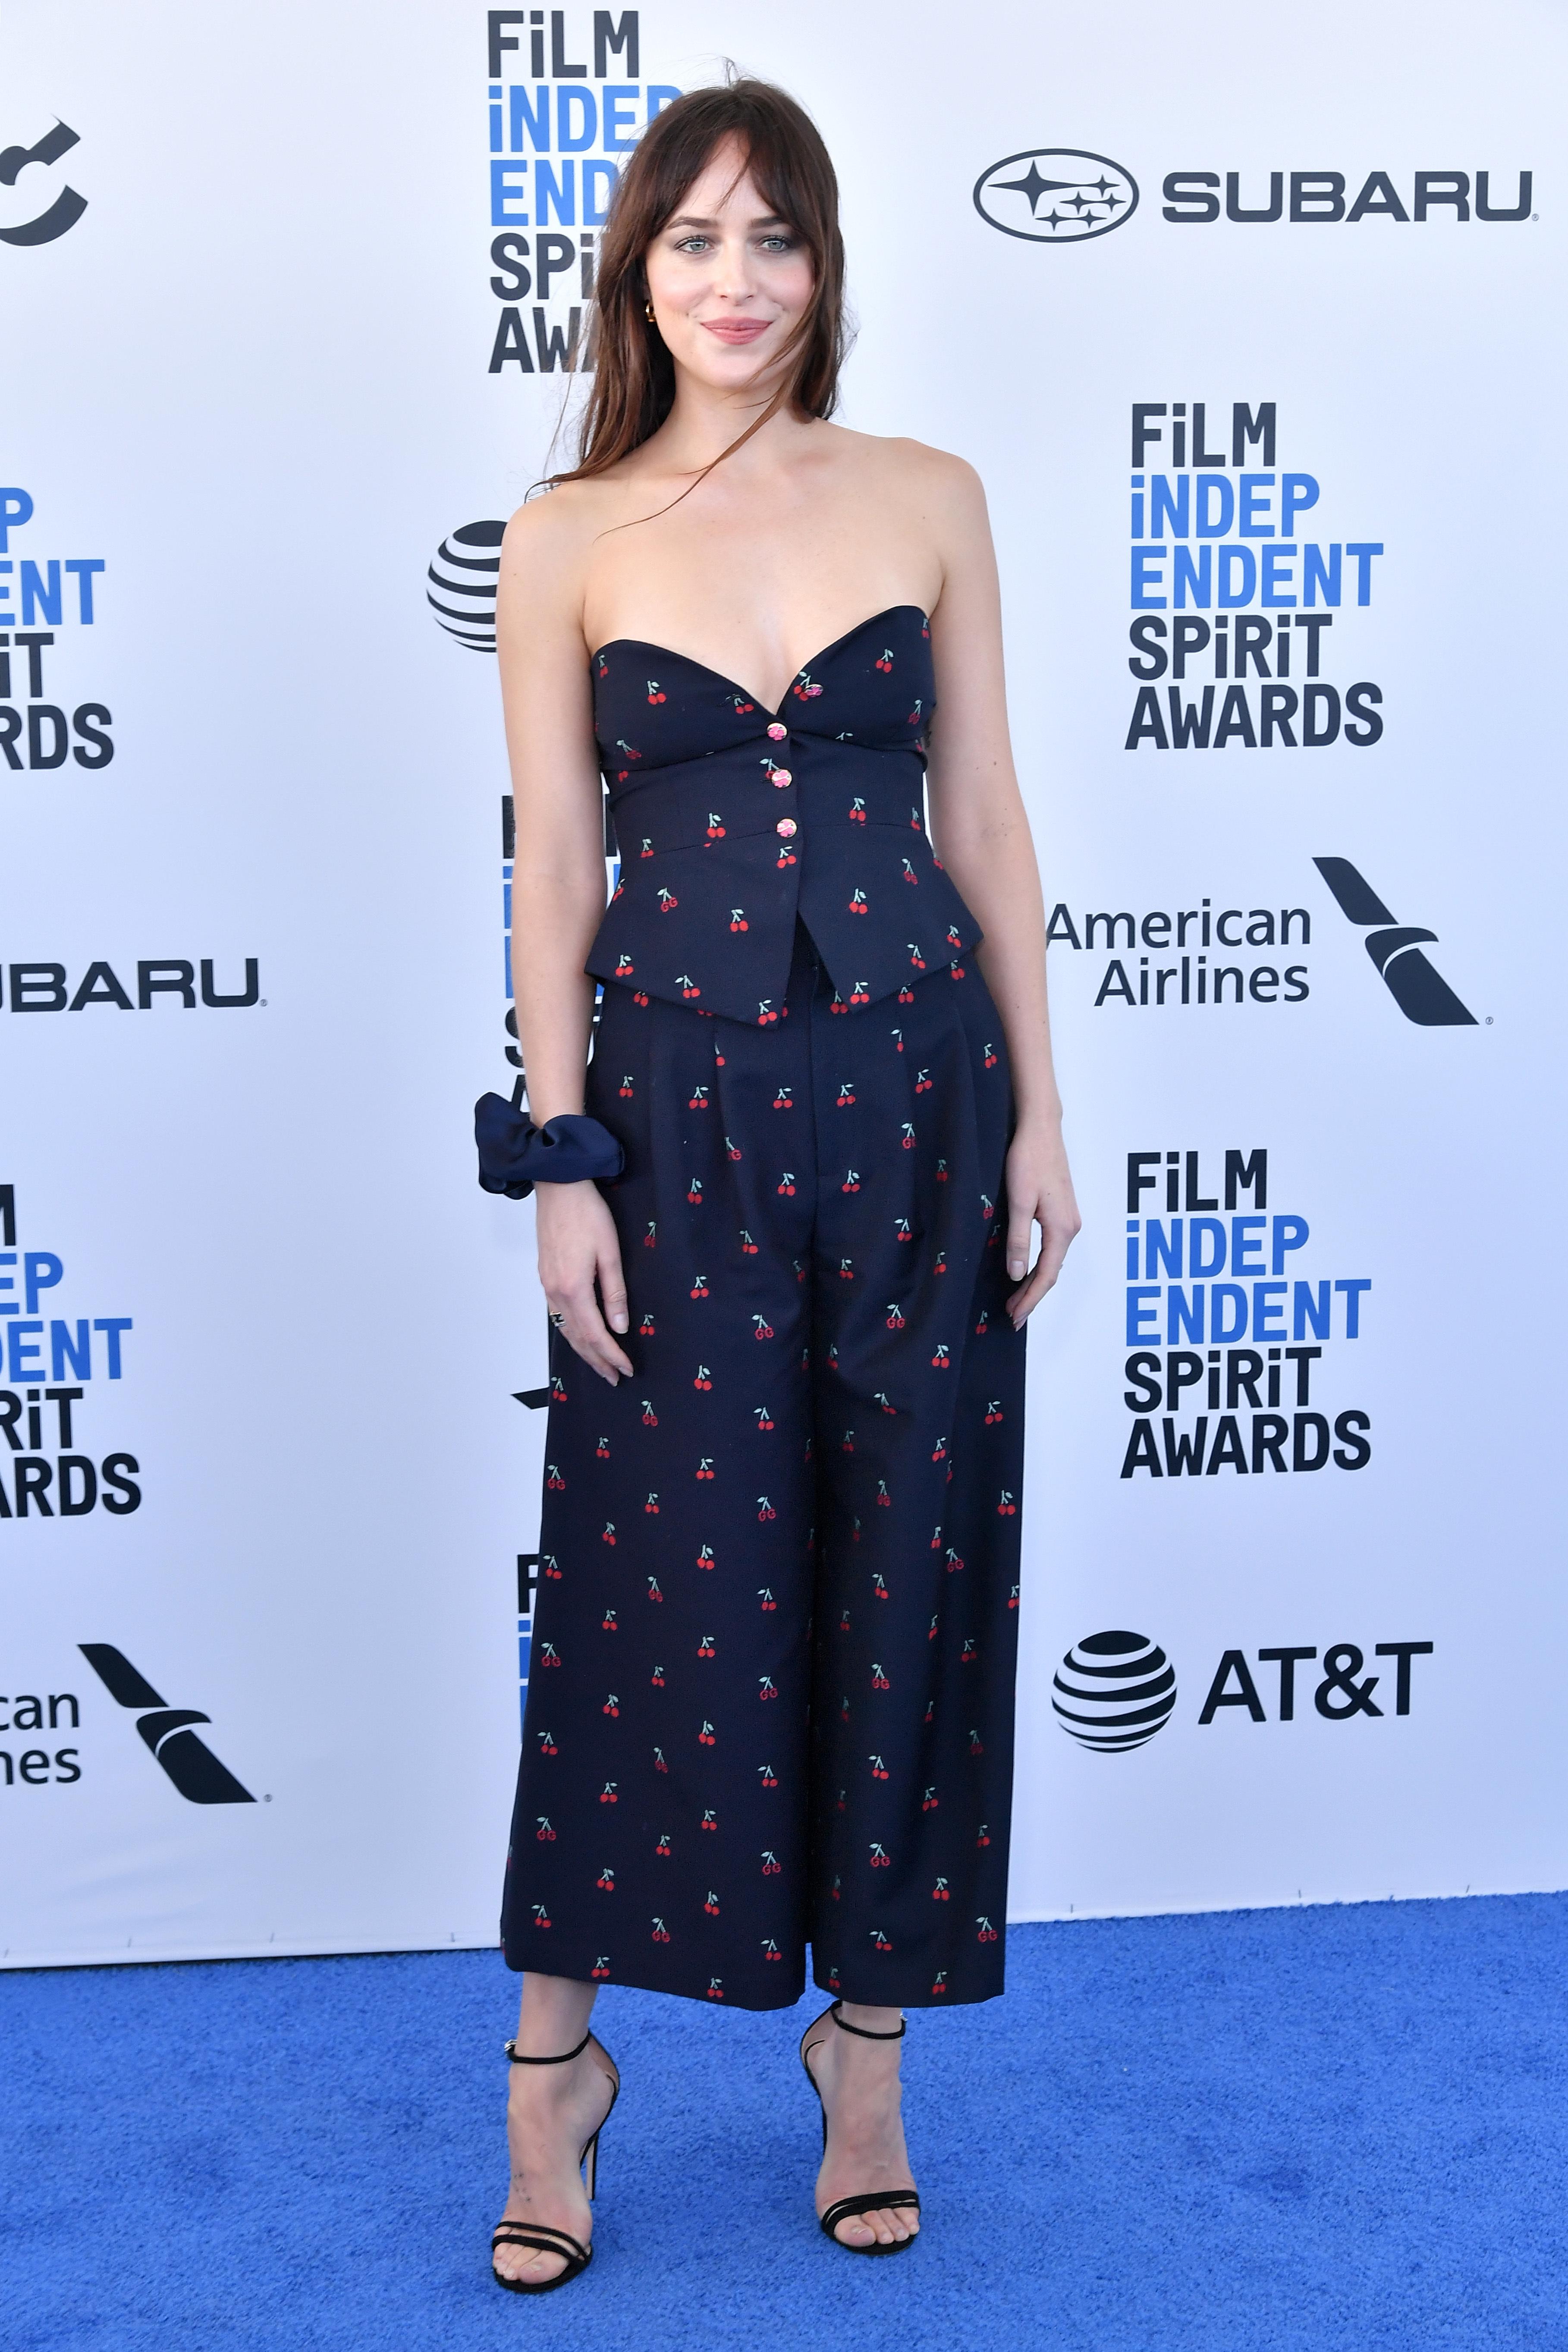 Dakota Johnson attends the 34th Film Independent Spirit Awards in Santa Monica, Calif., on Feb. 23, 2019.